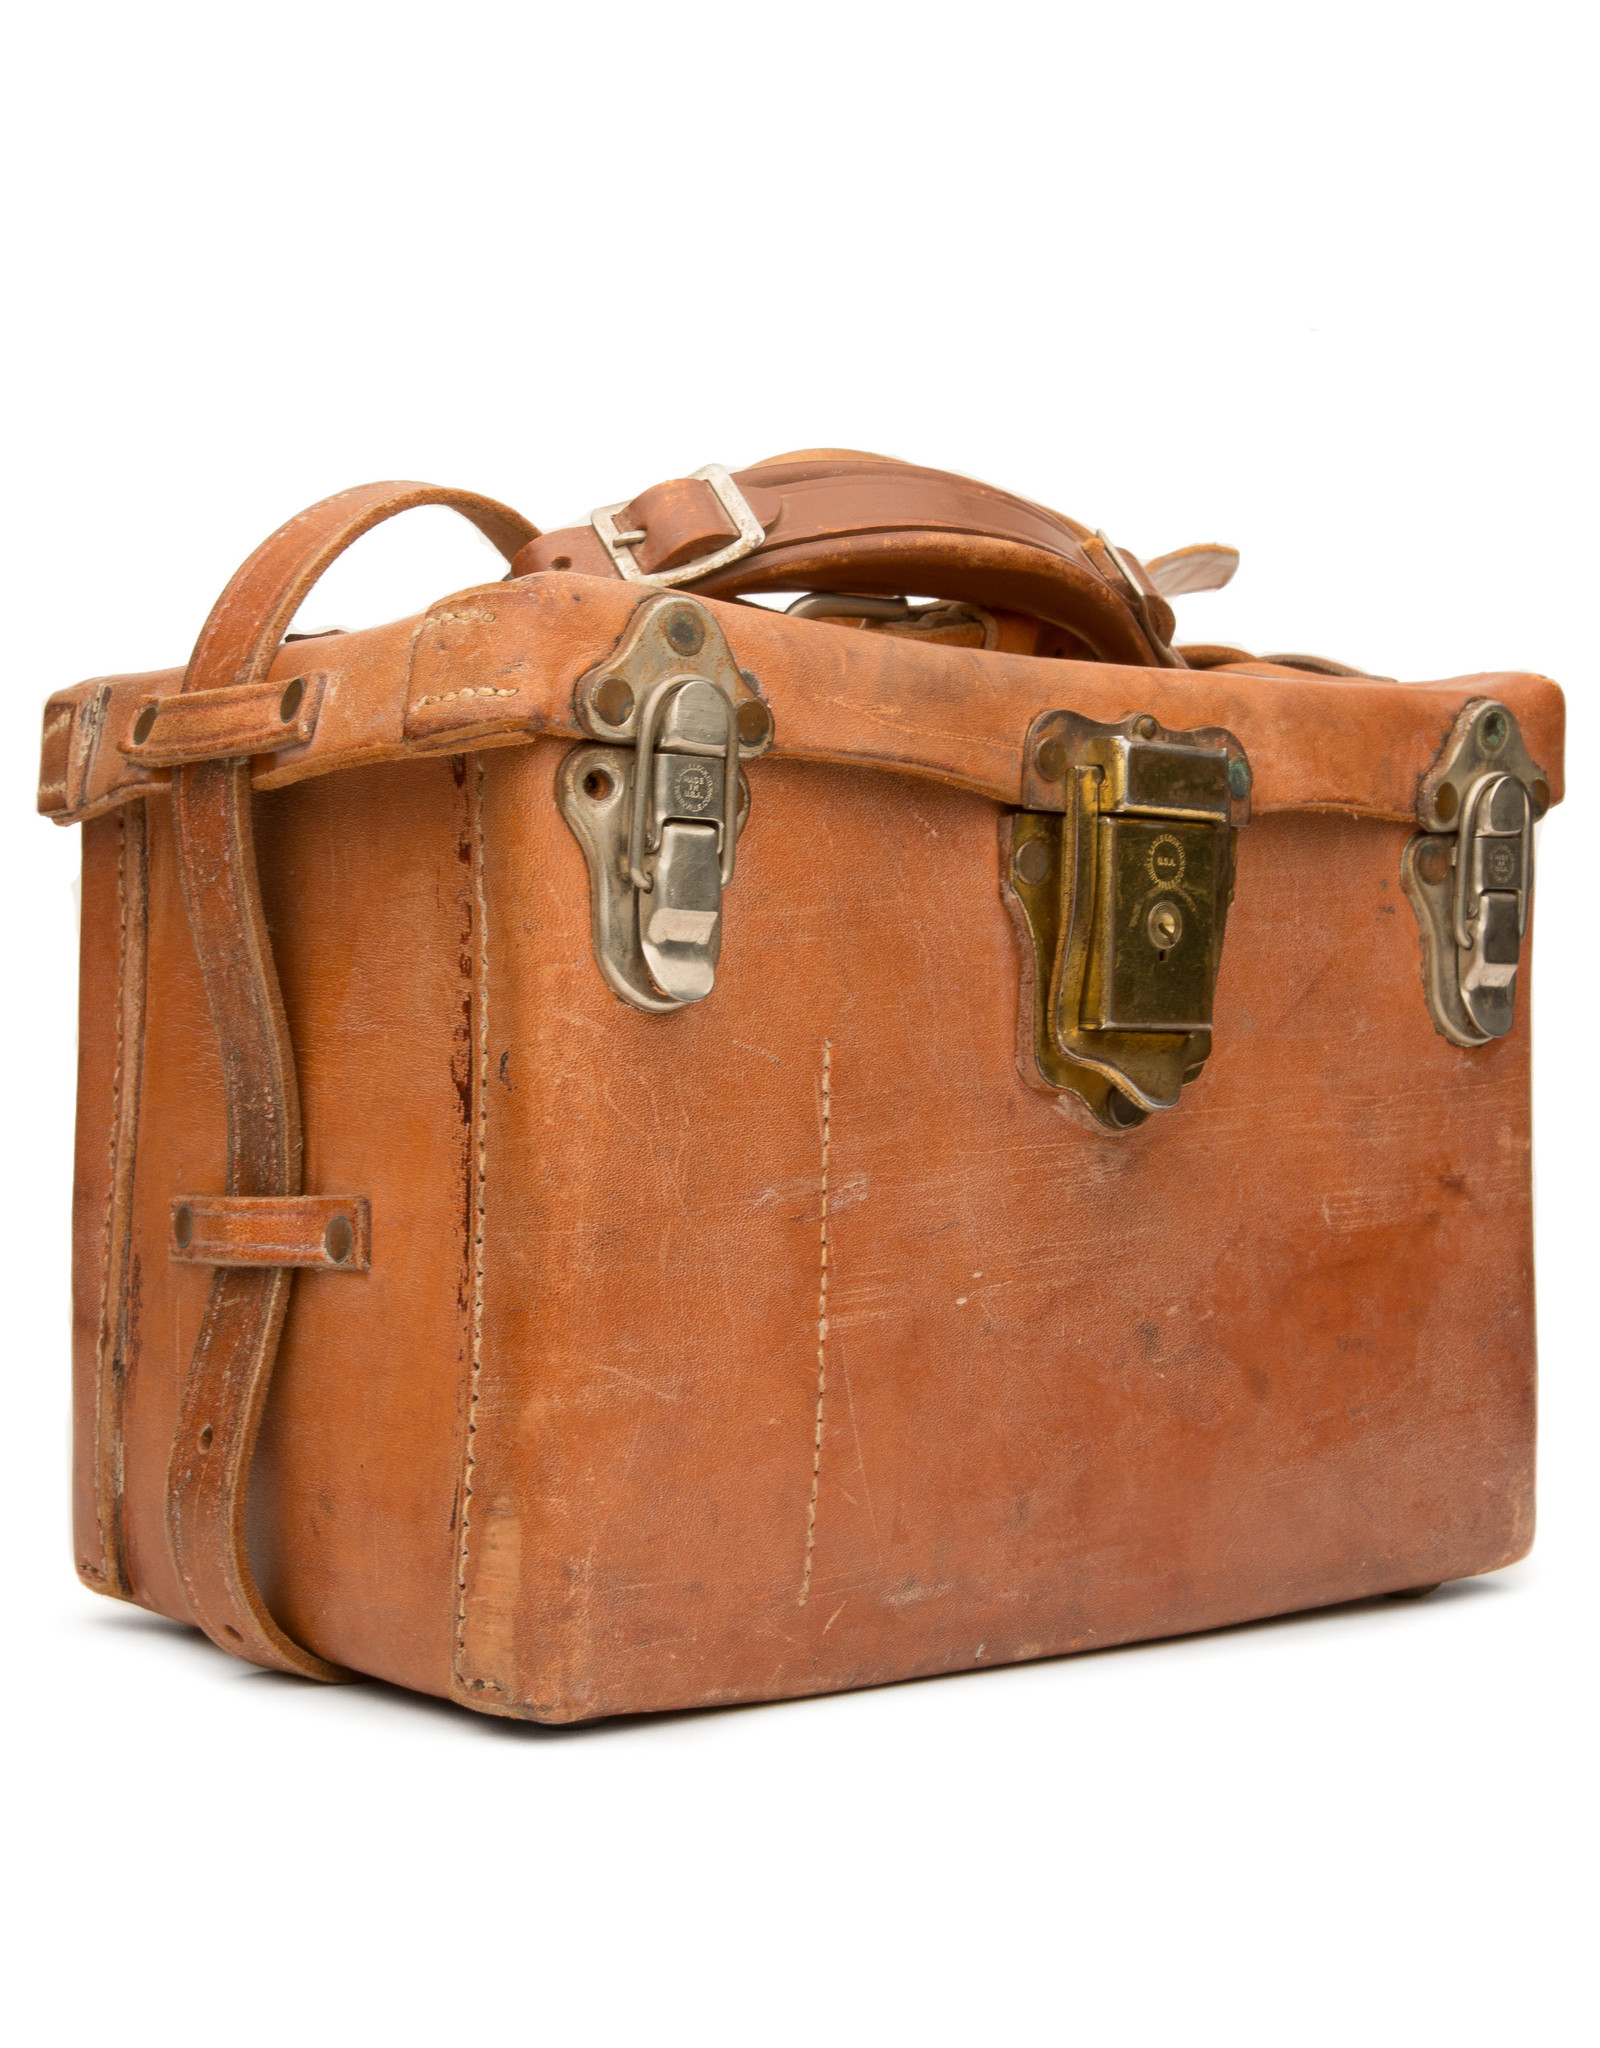 acme camera Vintage Hard Sided Leather camera bag medium deluxe